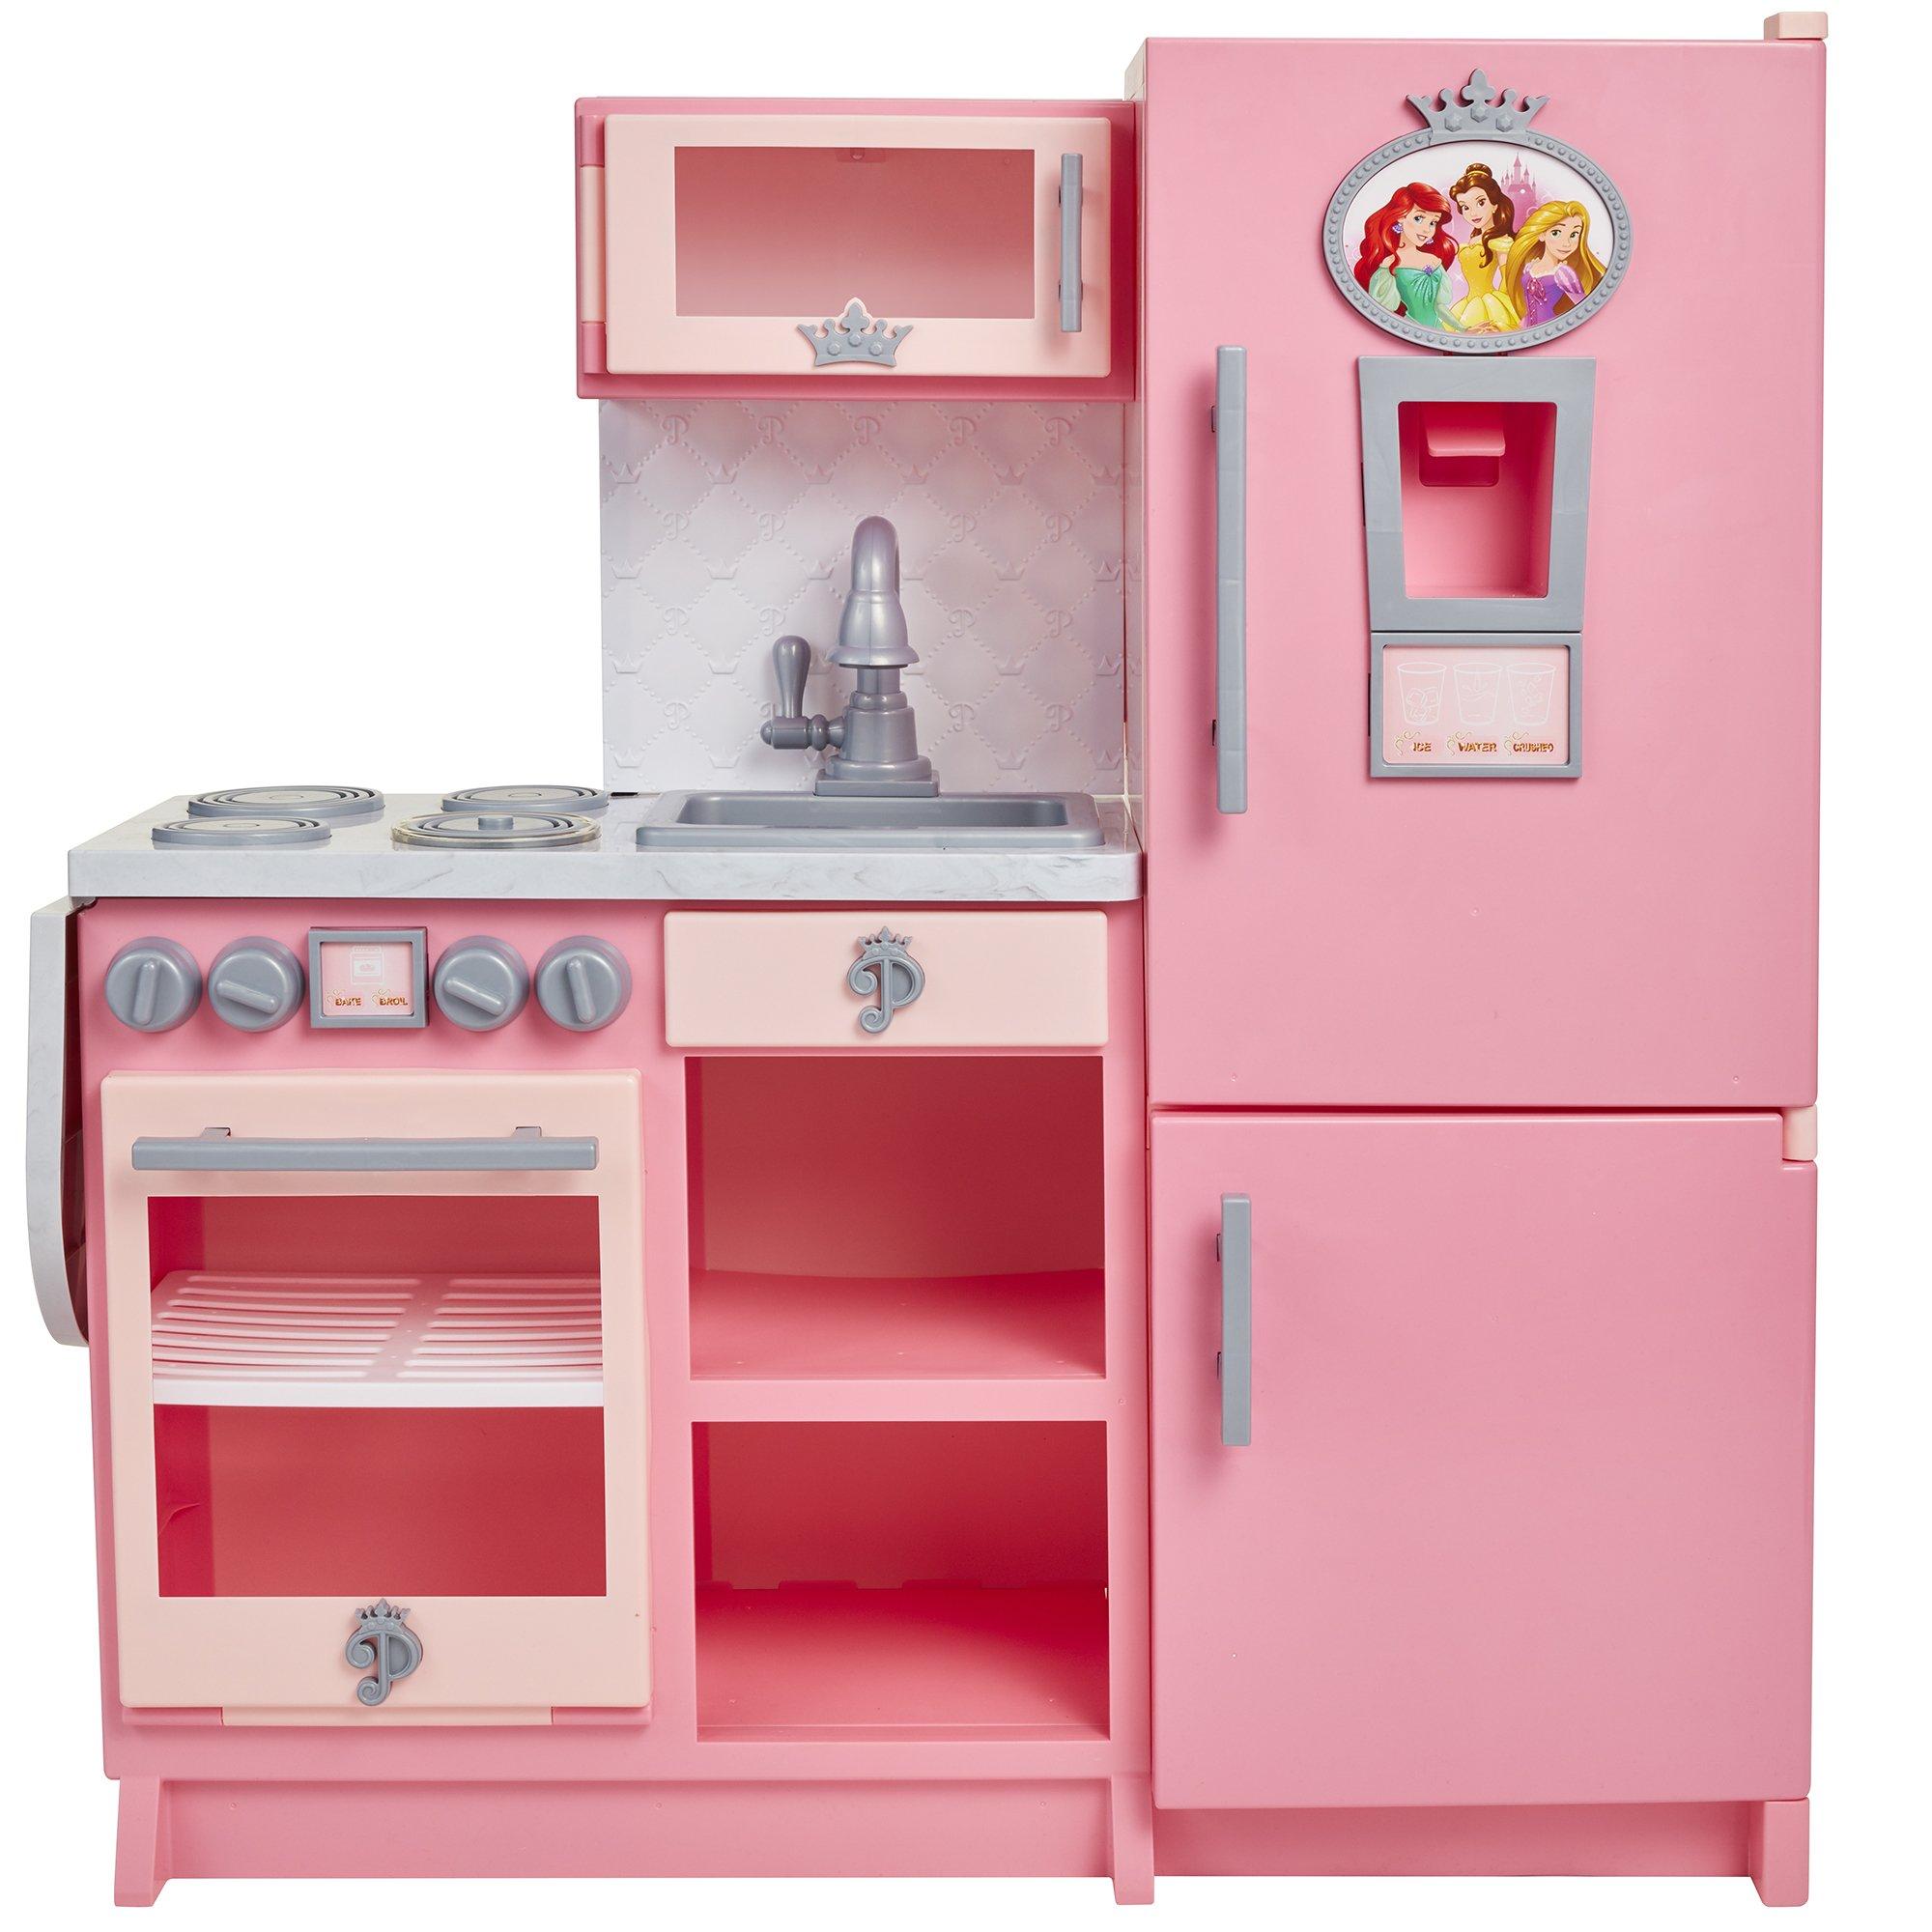 Disney Princess Style Collection Gourmet Kitchen by Disney Princess